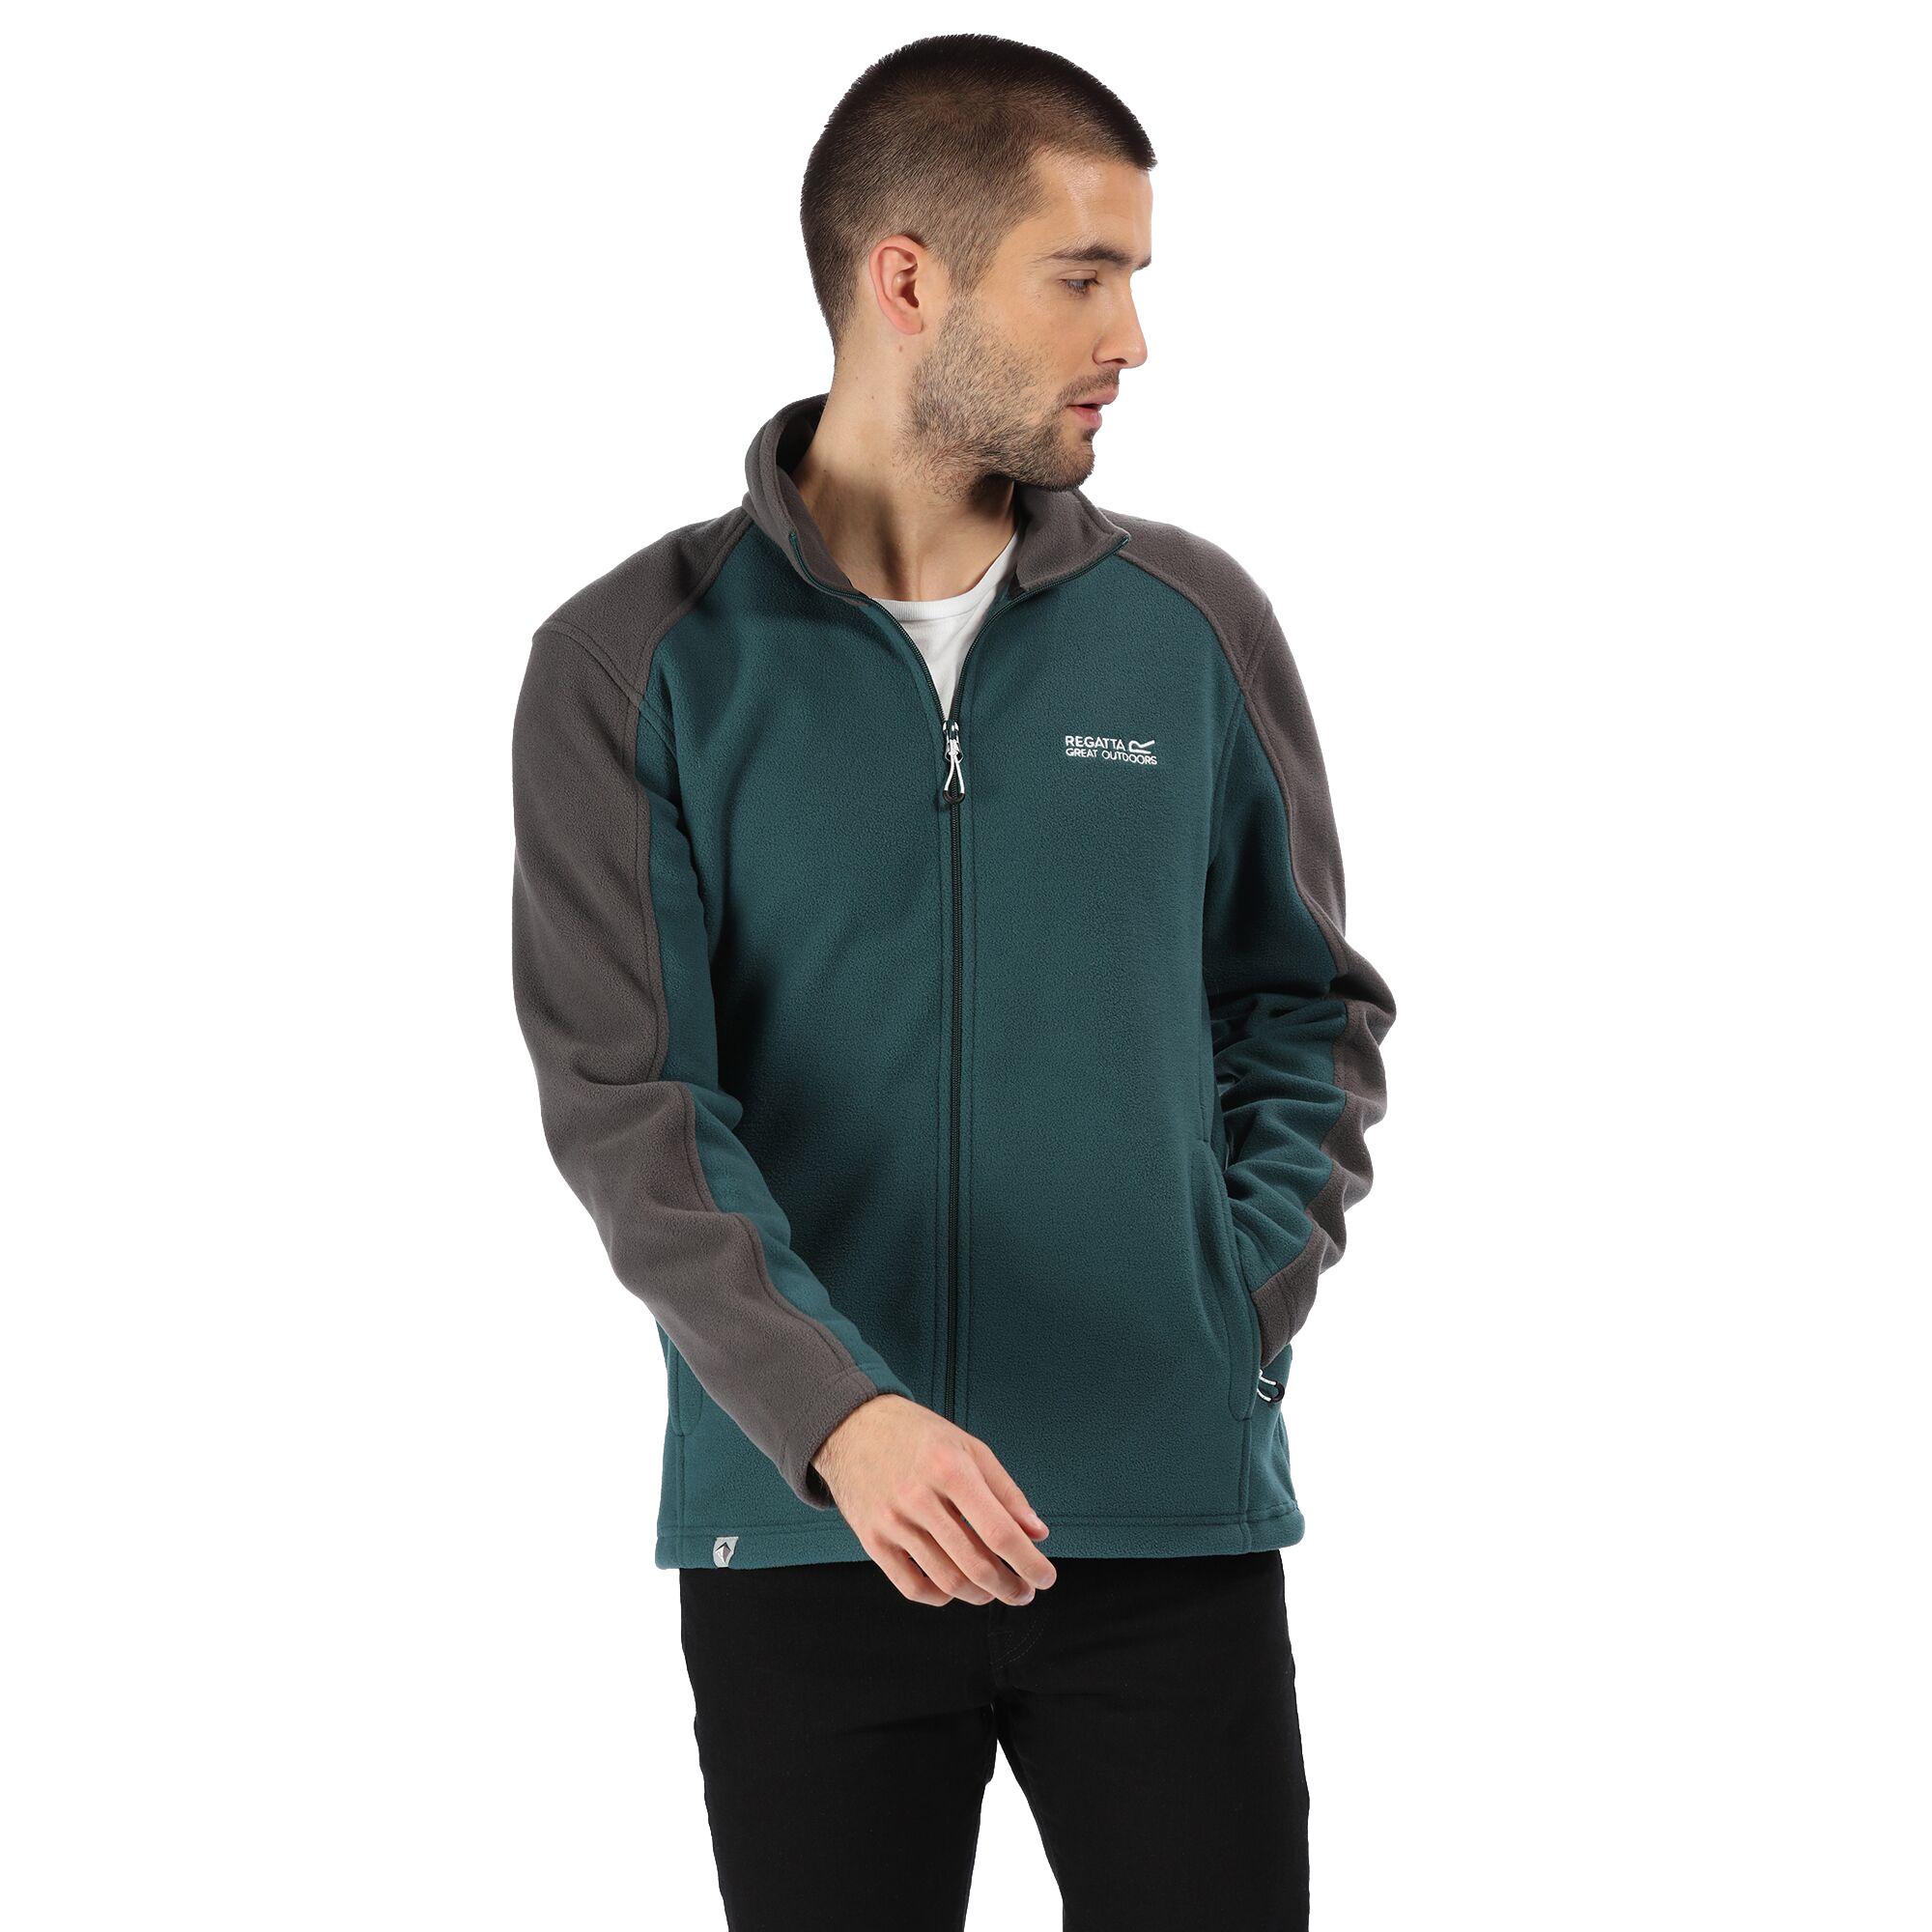 Regatta Hedman Mens Full Zip Mid-Weight Fleece Jacket 3XL